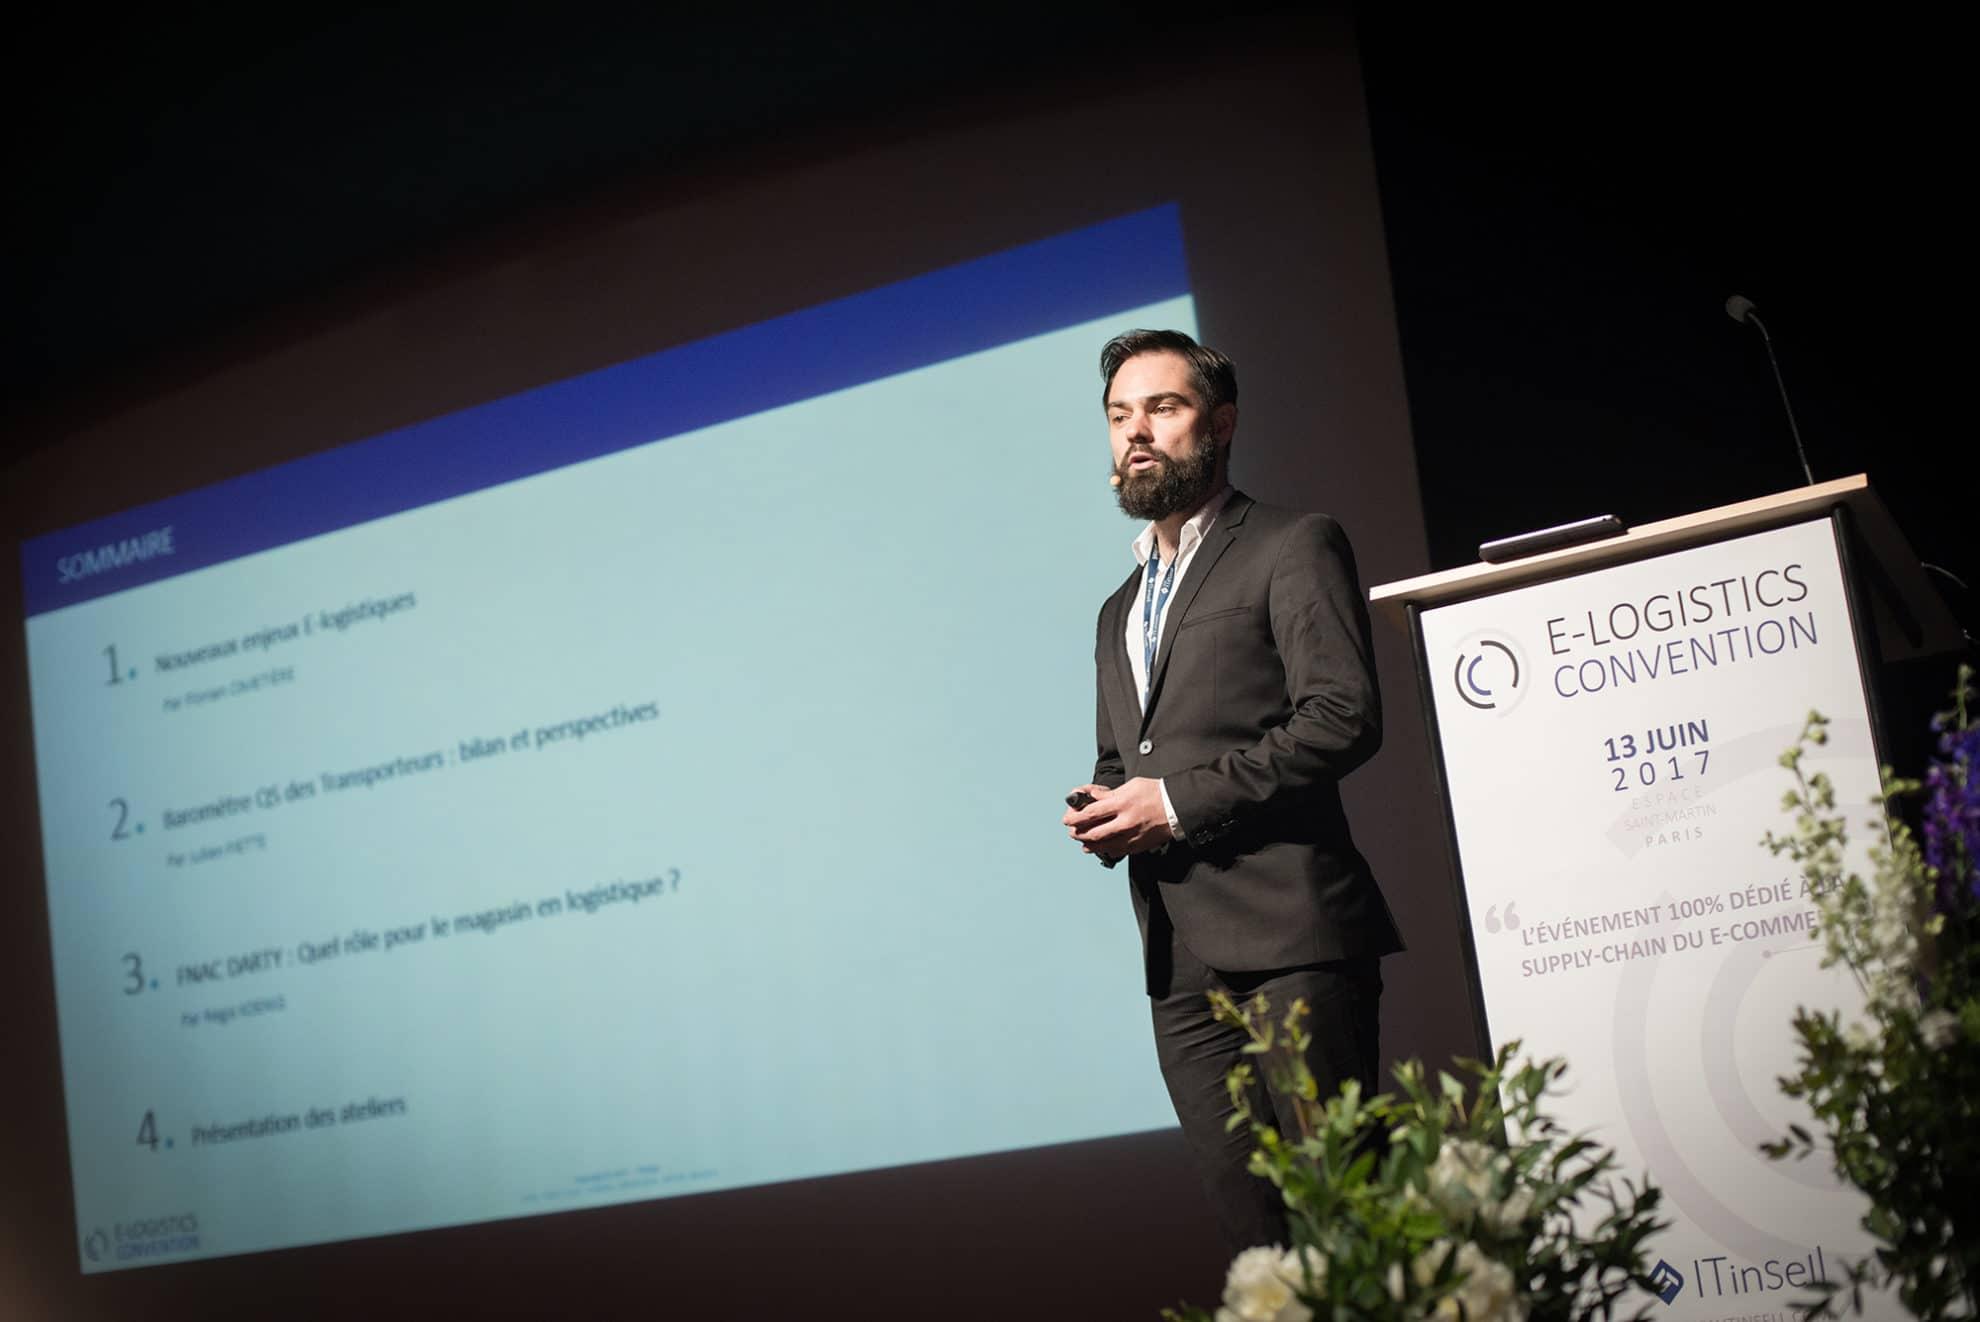 elogistic_convention-045-BD